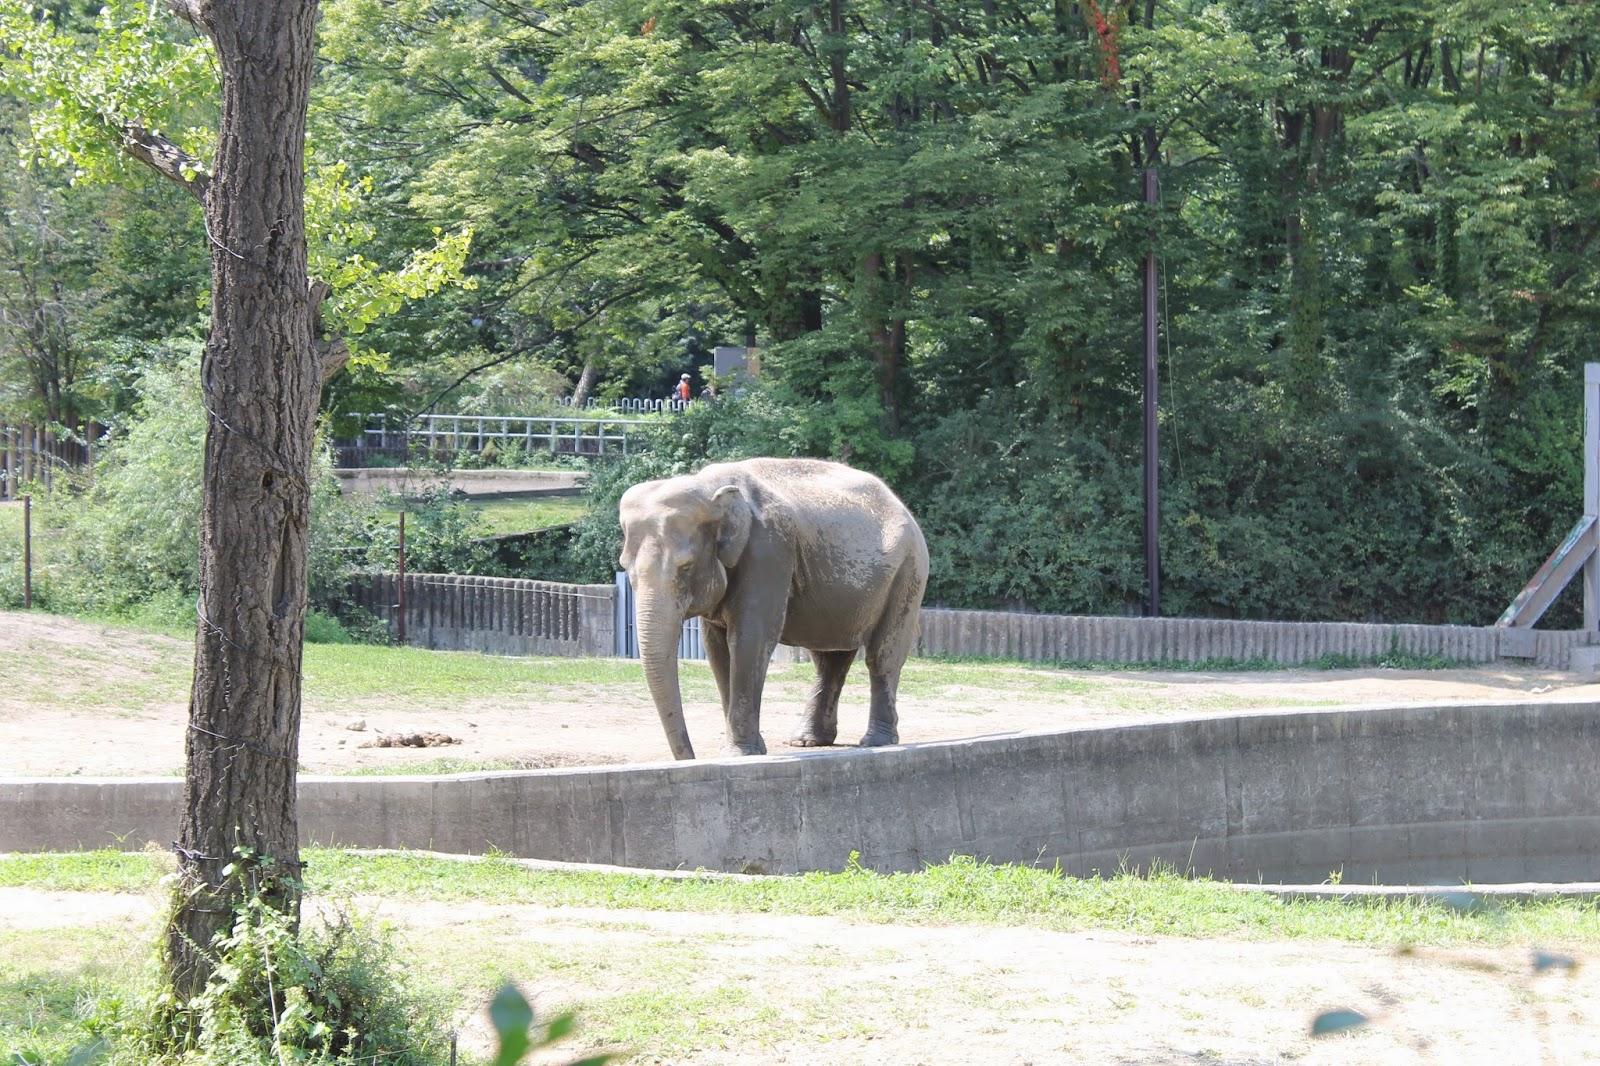 Seoul Zoo, Seoul, зоопарк в сеуле, сеул, корея, зоопарк, слон